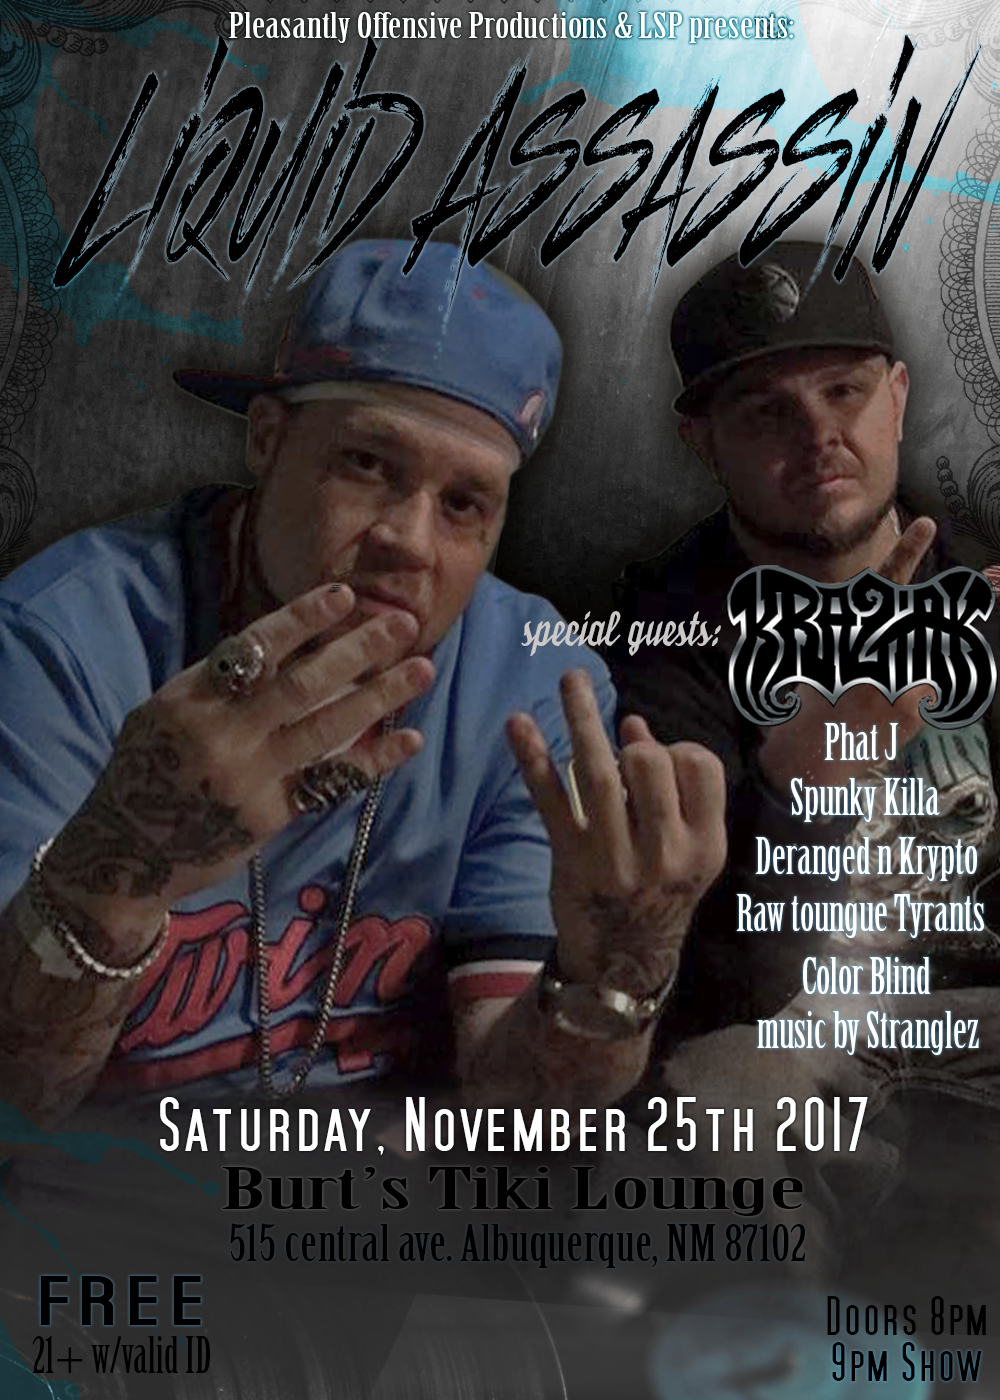 LA kraziak show flyer